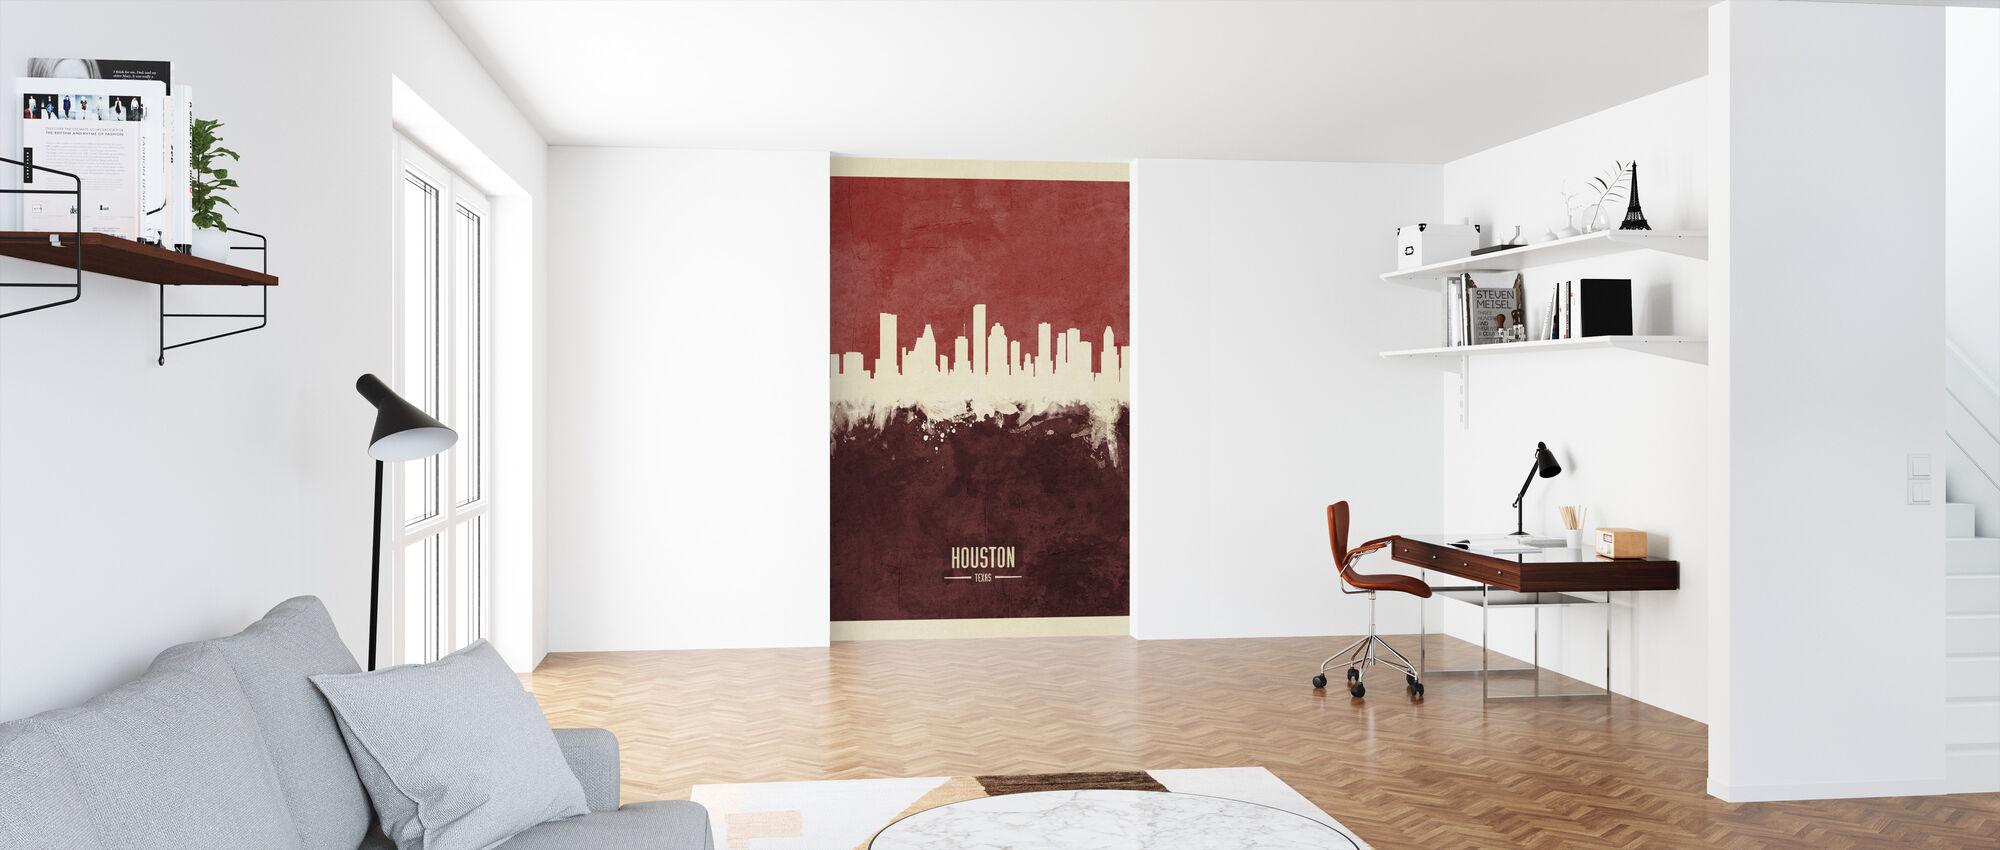 Houston Texas Skyline Rød - Tapet - Kontor